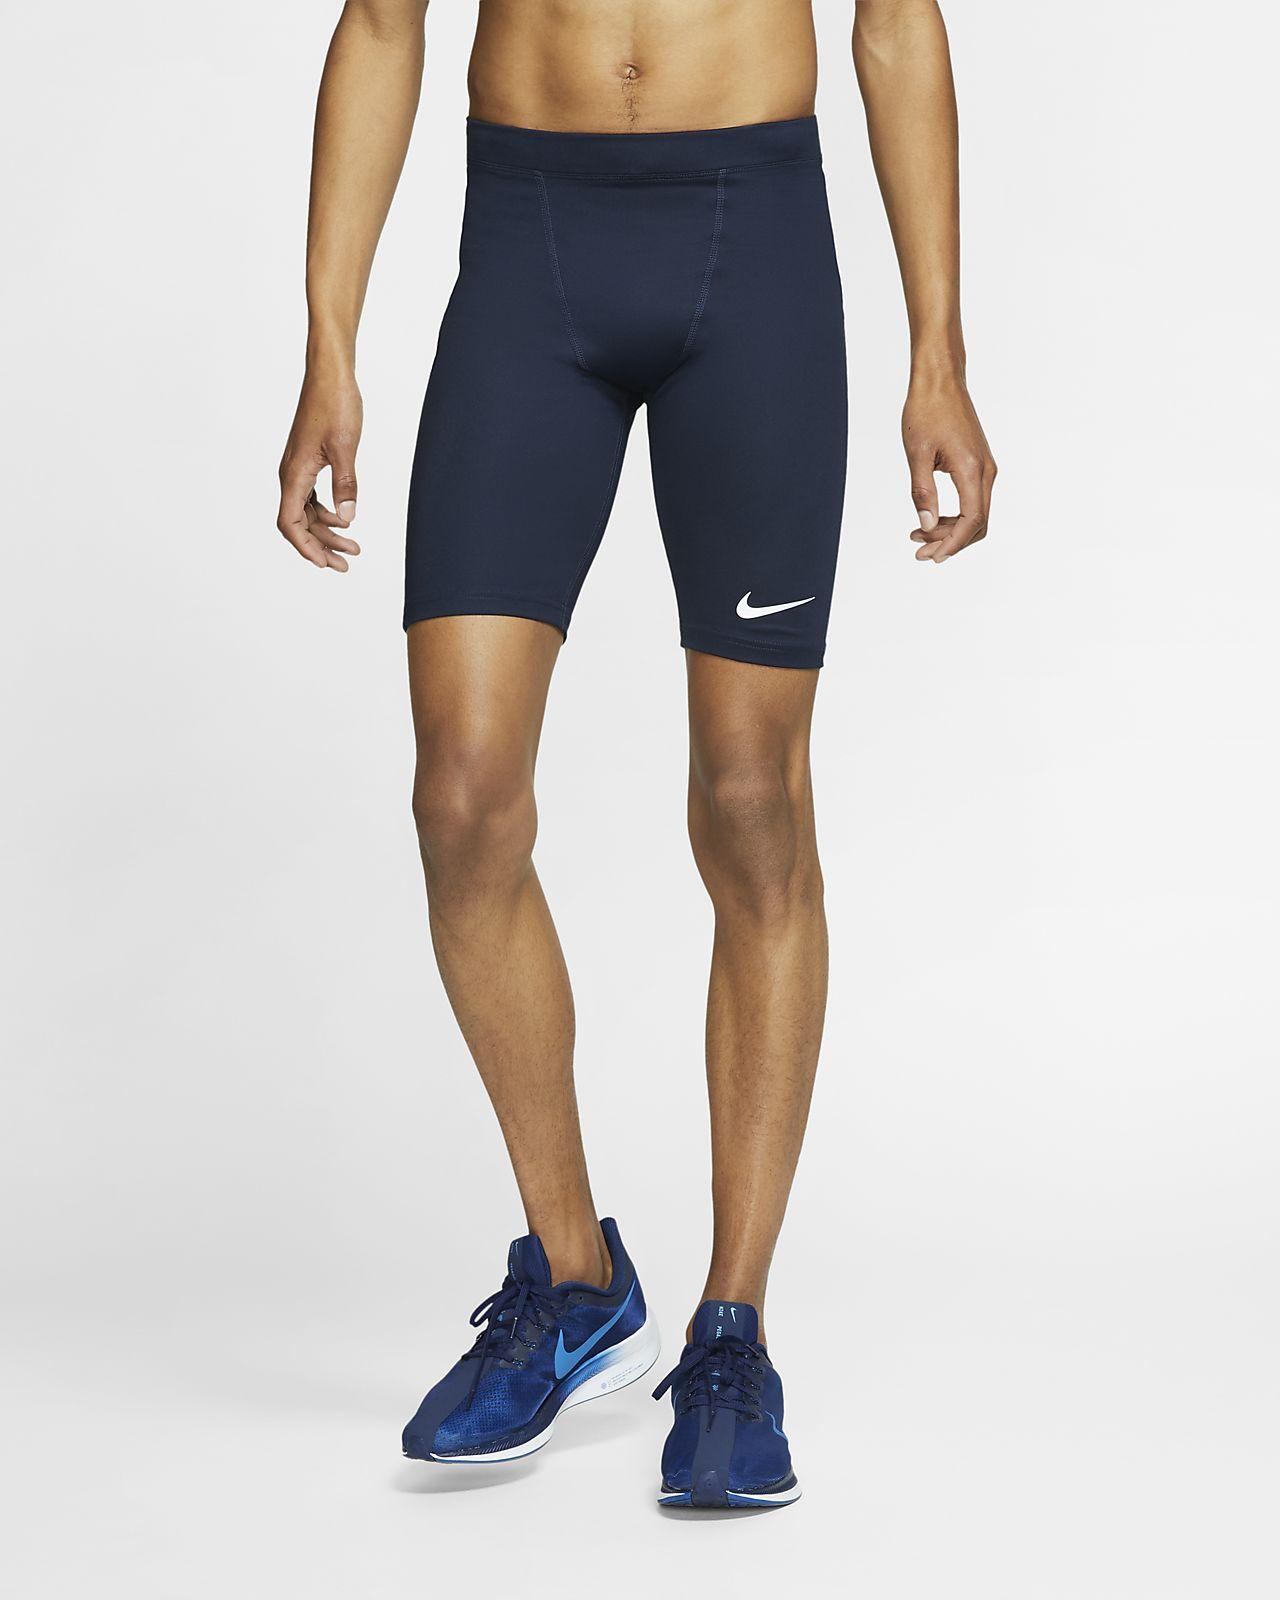 Collant de running Nike Power pour Homme